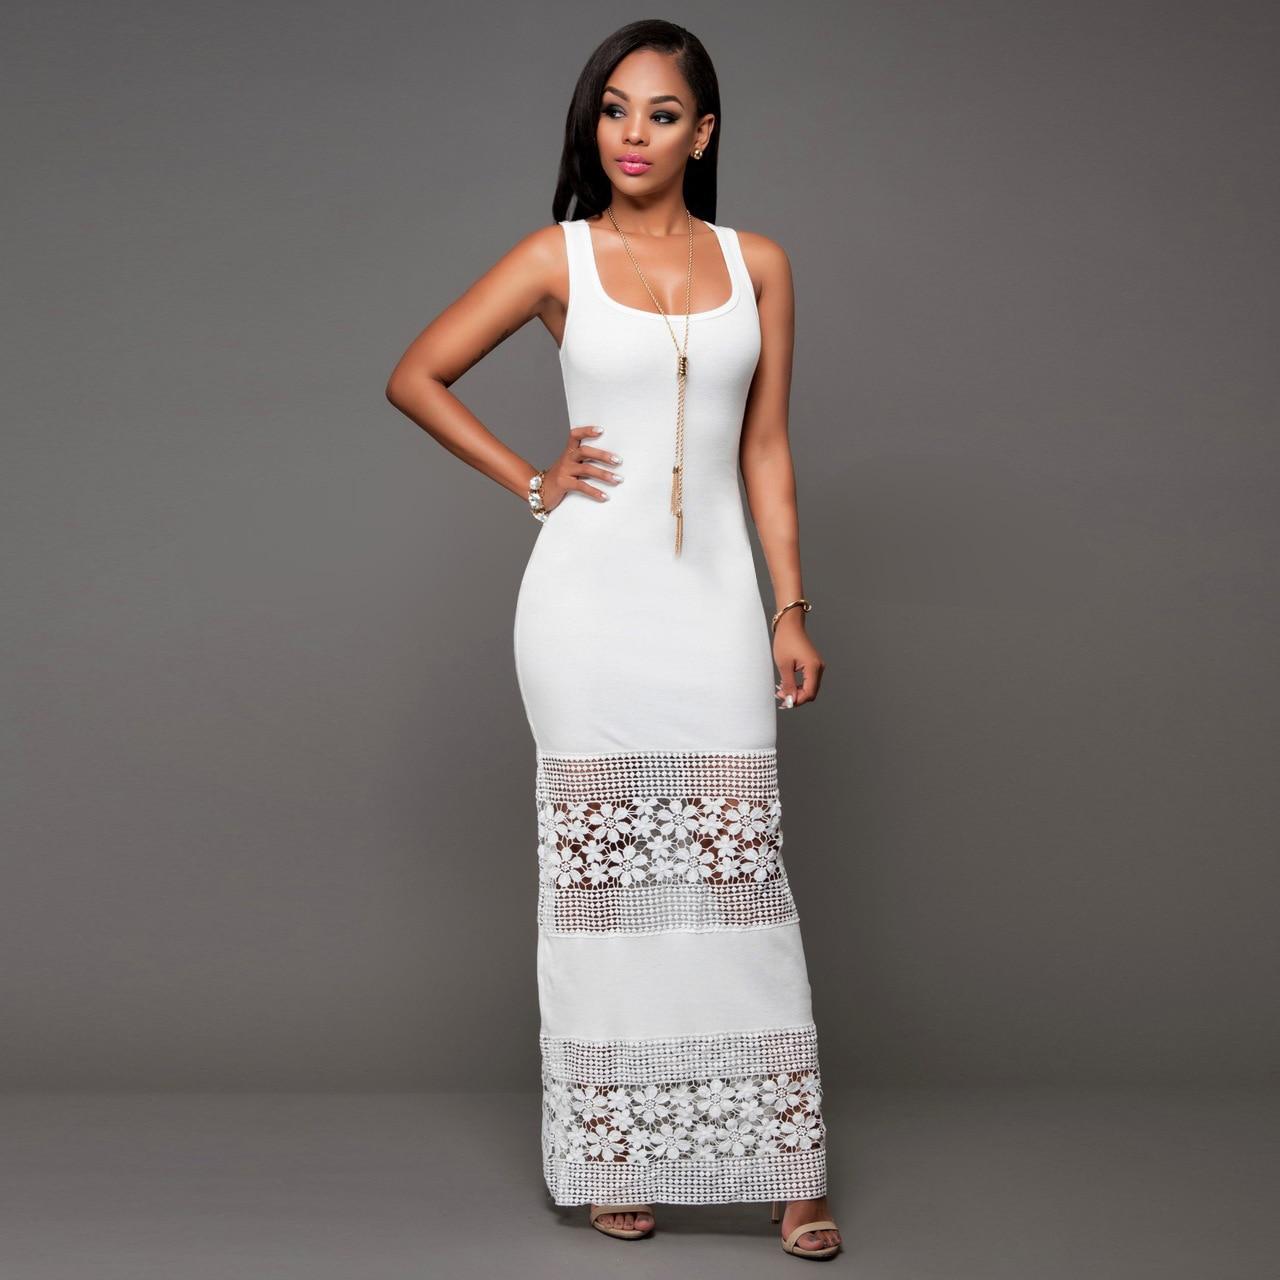 robe sexy femme floor length gown sexy club see through summer dress vestido de festa big size. Black Bedroom Furniture Sets. Home Design Ideas